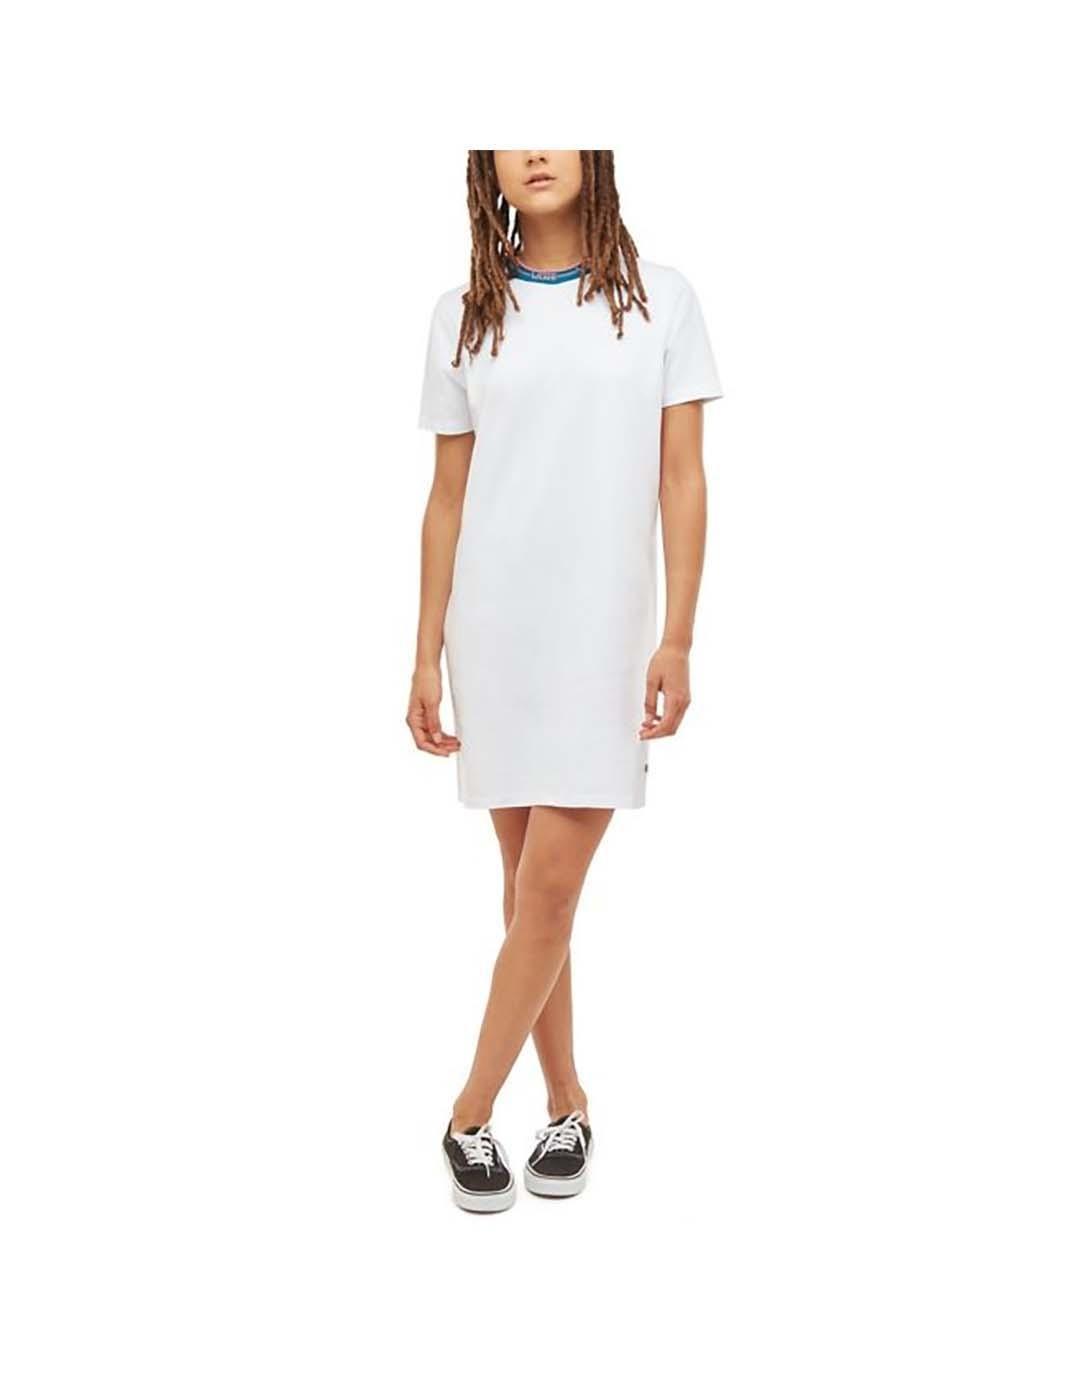 2vans vestidos mujer